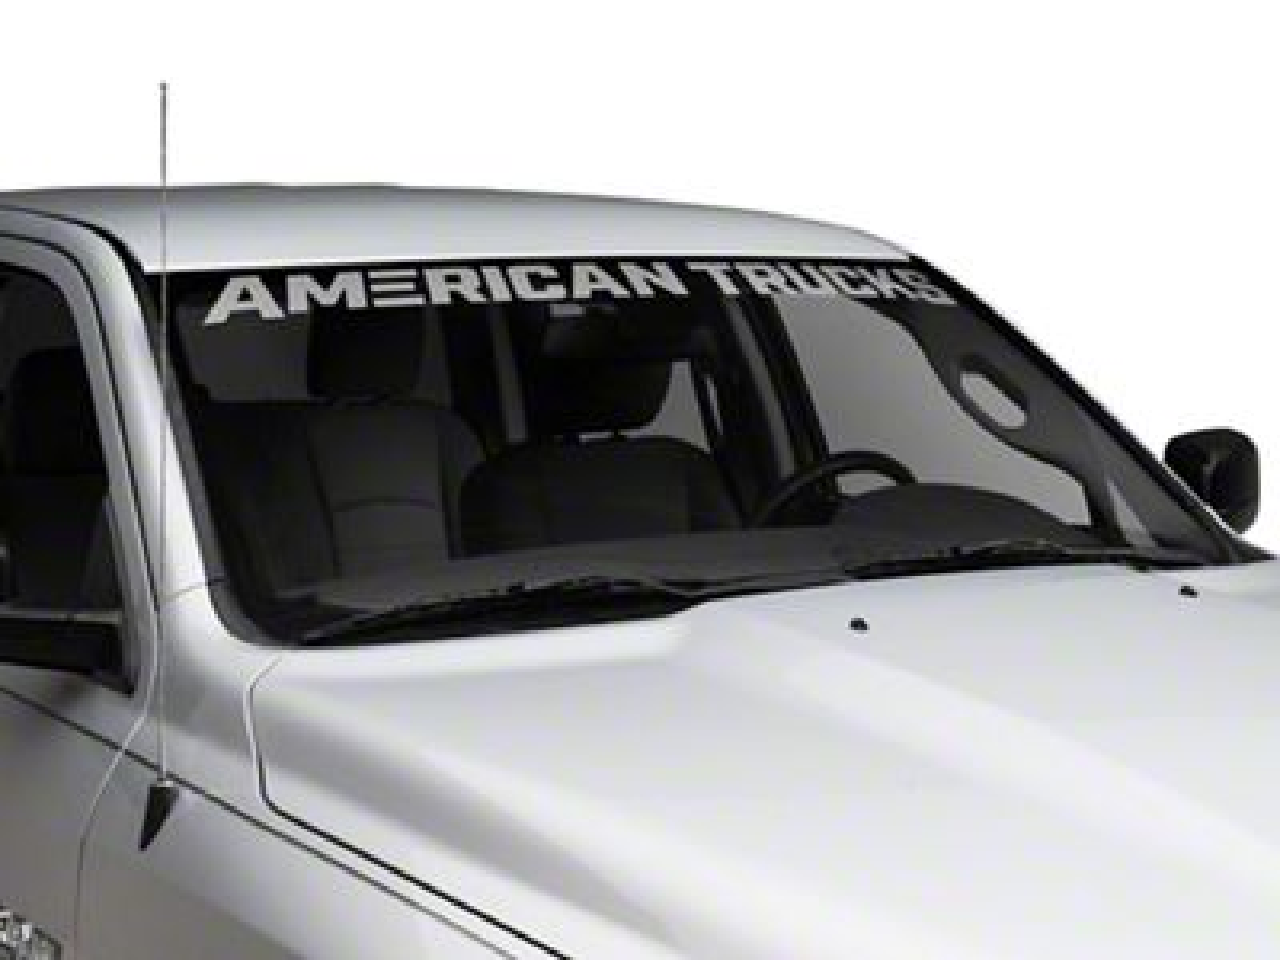 AmericanTrucks Windshield Banner - Frosted (02-19 RAM 1500)